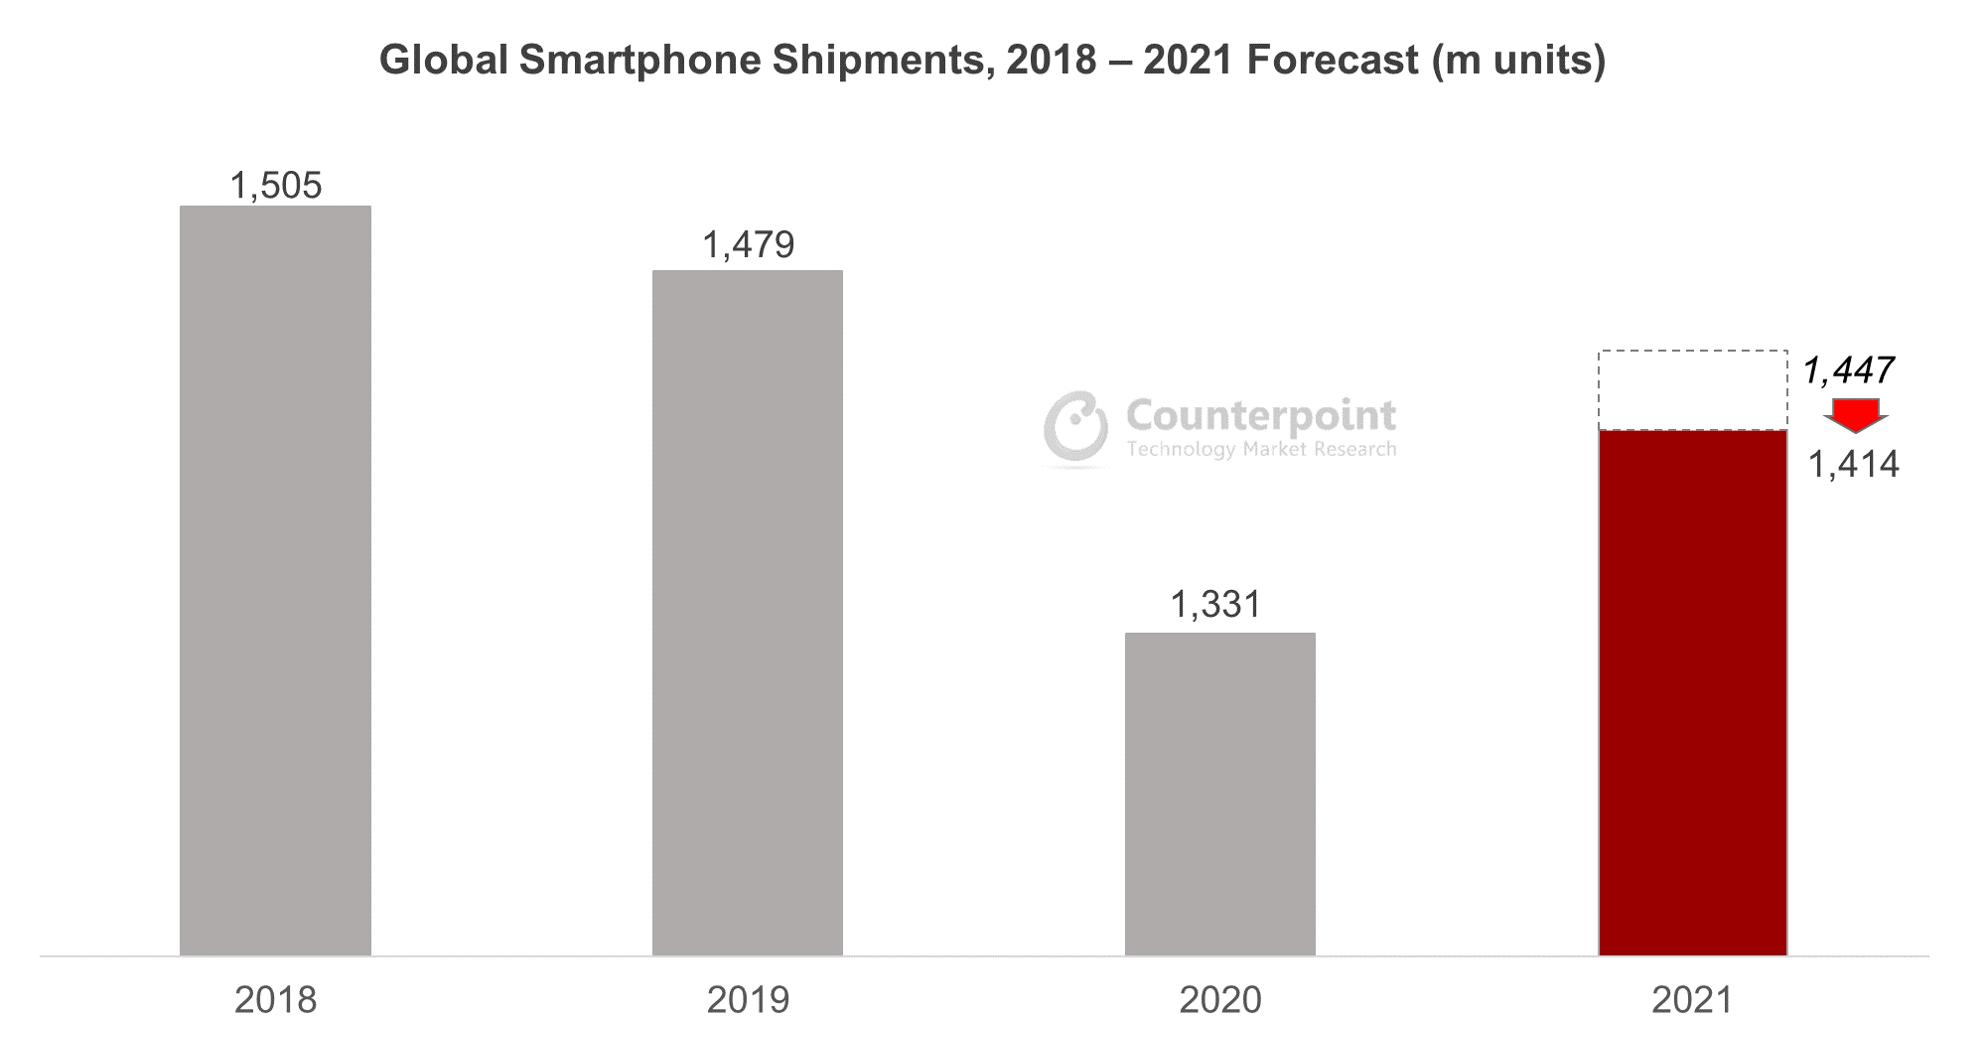 Global Smartphone Shipments, 2018 – 2021 Forecast (m units)